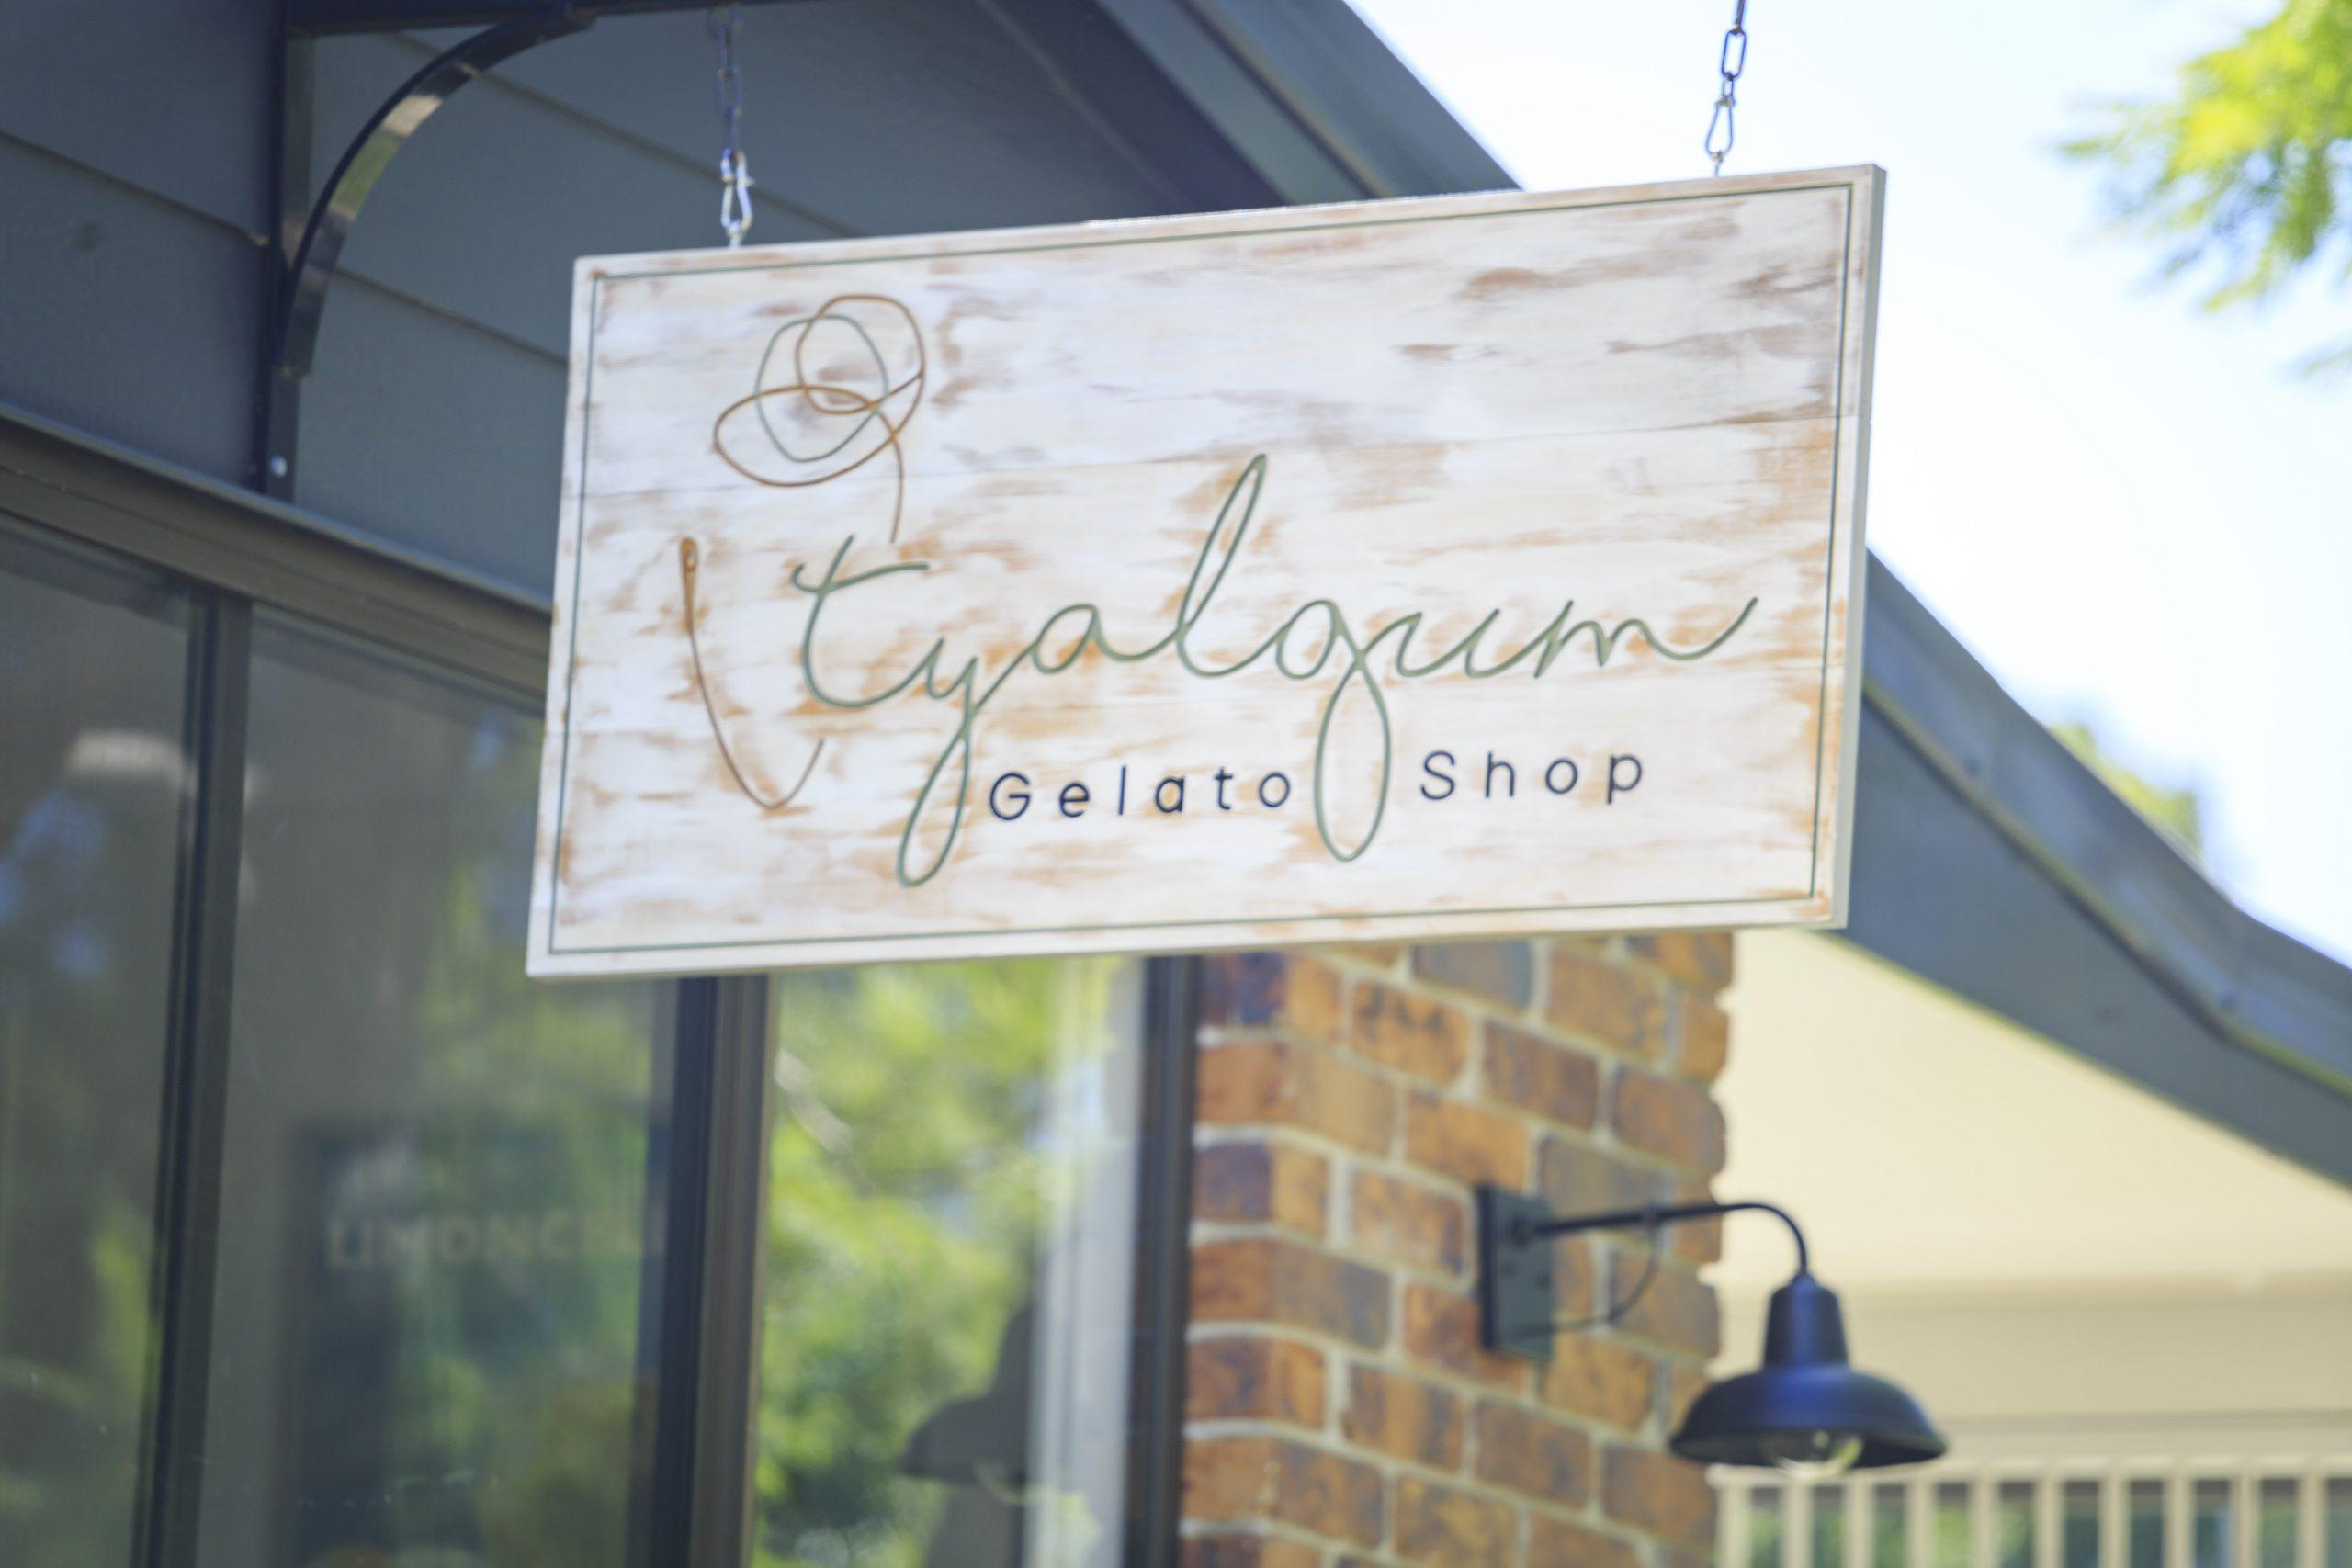 Tyalgum Gelato Shop